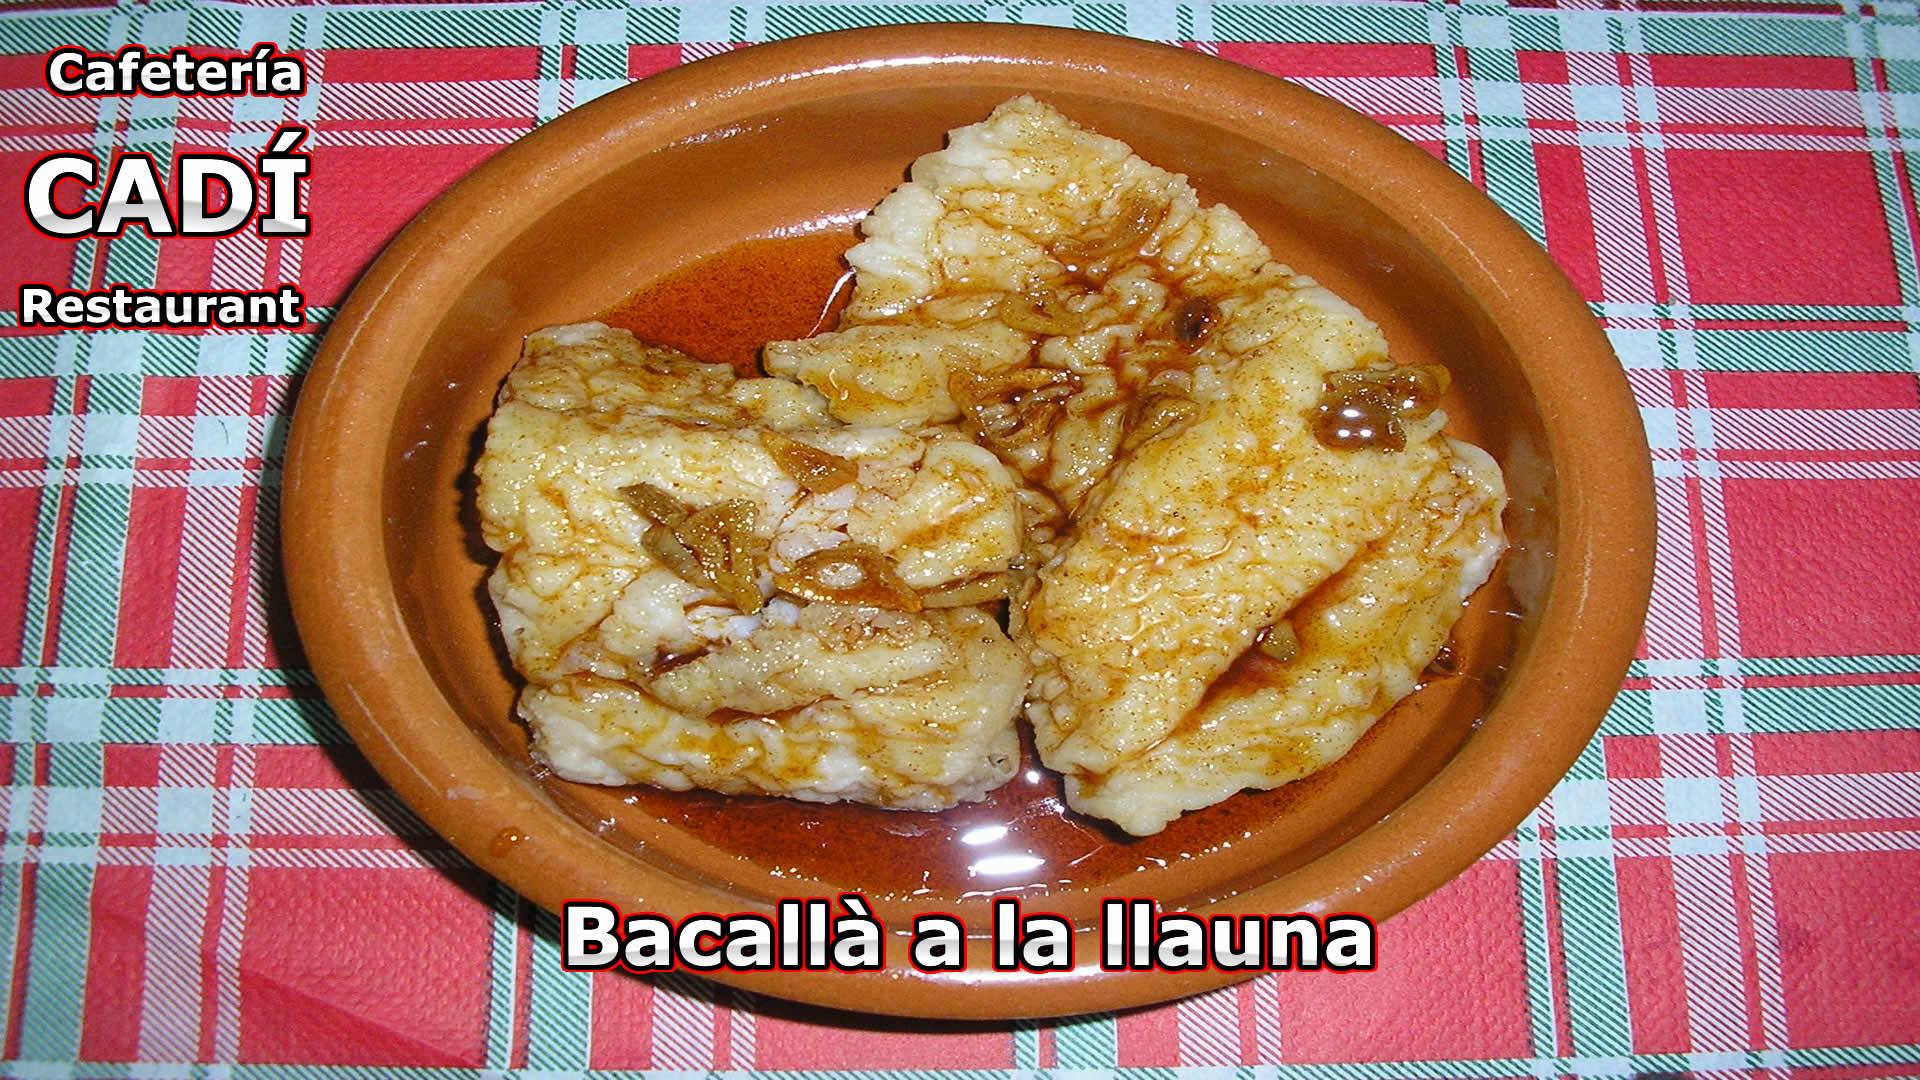 Bacallá Llauna